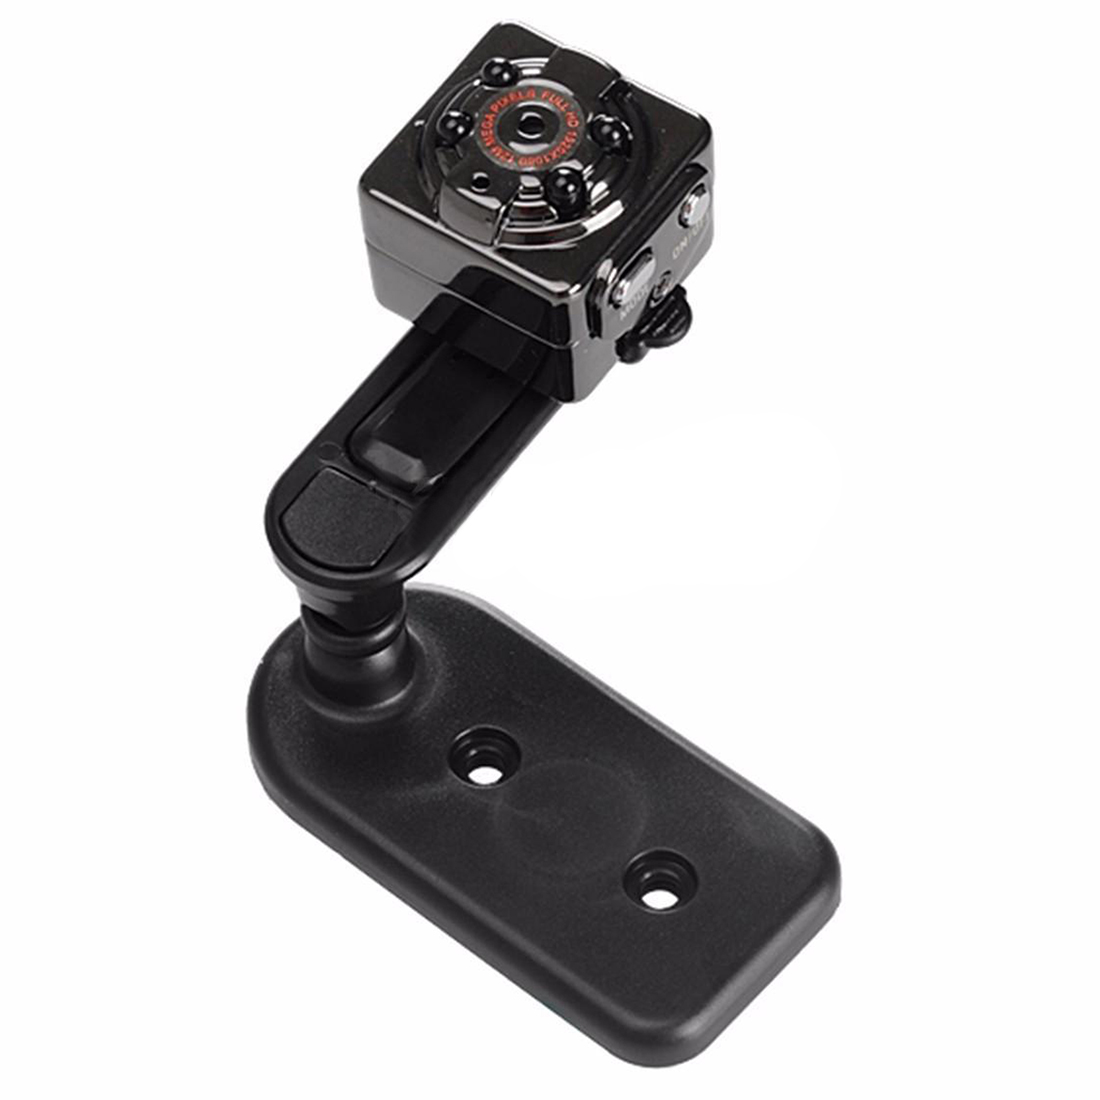 Wholesale SQ8 Mini DV Camera 1080P Full HD Car Sports IR Night Vision DVR Video Camcorder cheerson cx 20 cx20 rc quadcopter original parts sports hd dv camera 12 0mp